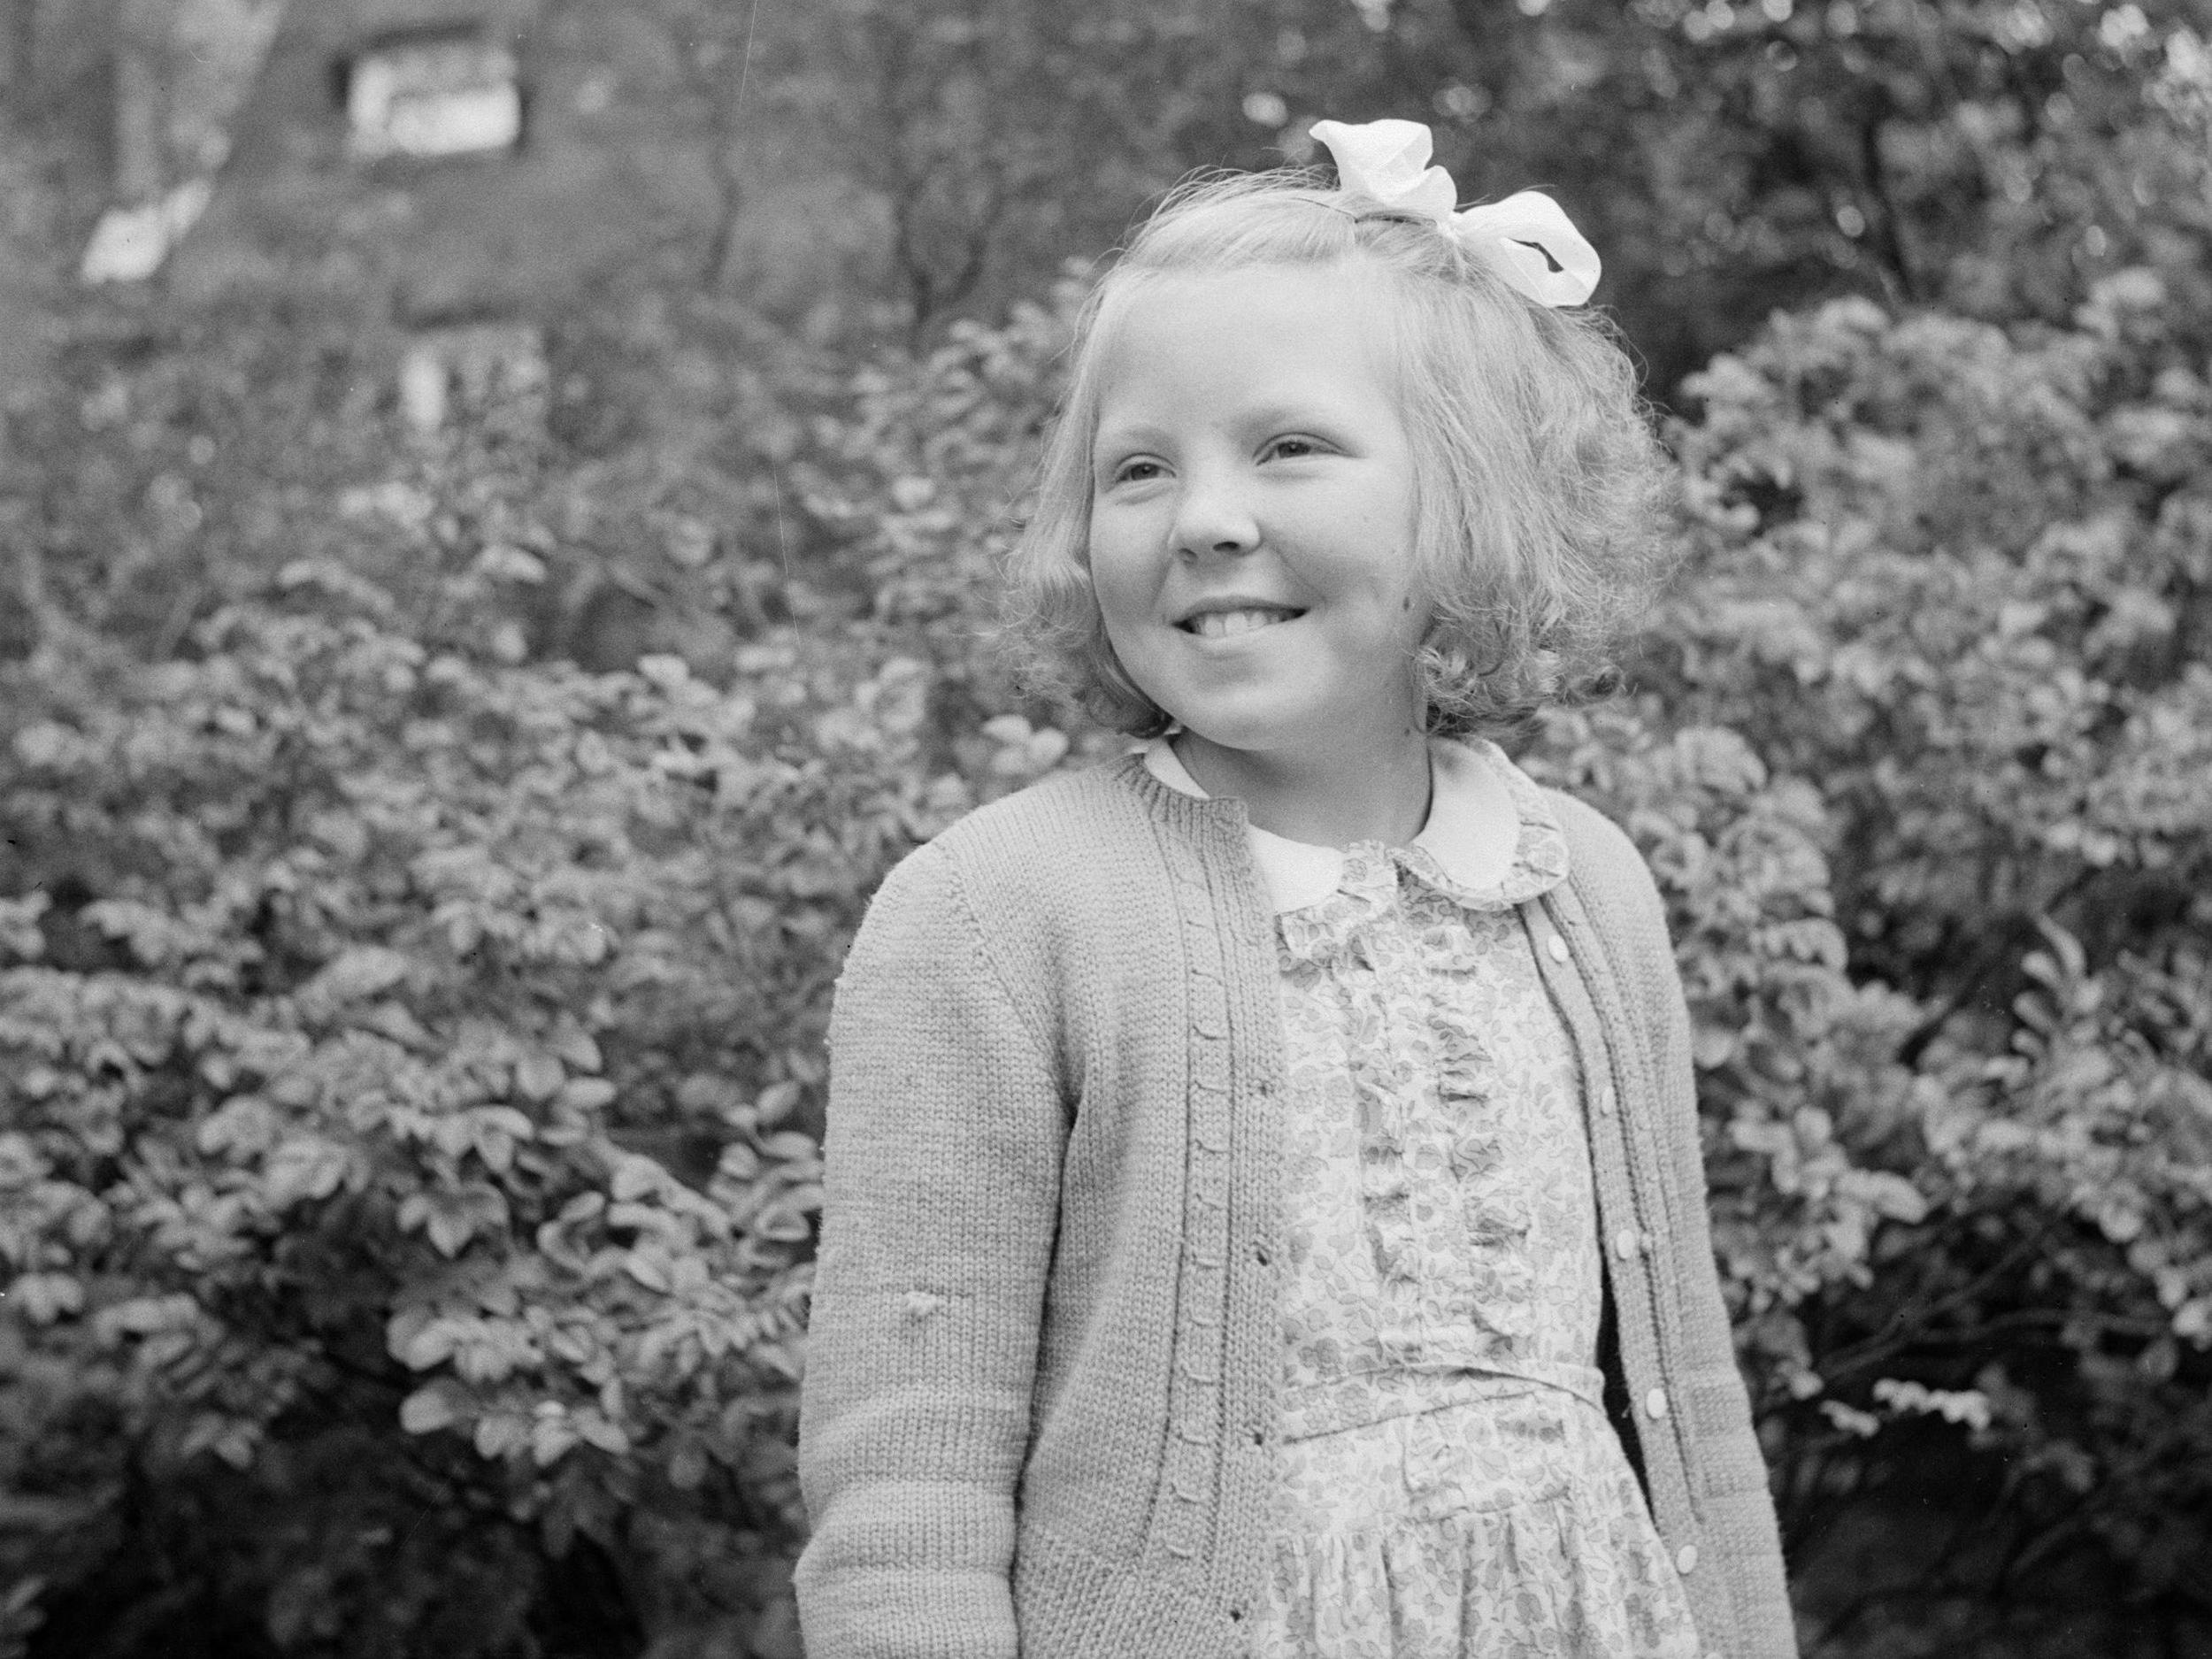 Prinzessin Beatrix der Niederlande im Jahr 1947.   Foto: Willem van de Poll, Nationaal Archief, Fotocollective van de Poll, Public Domain